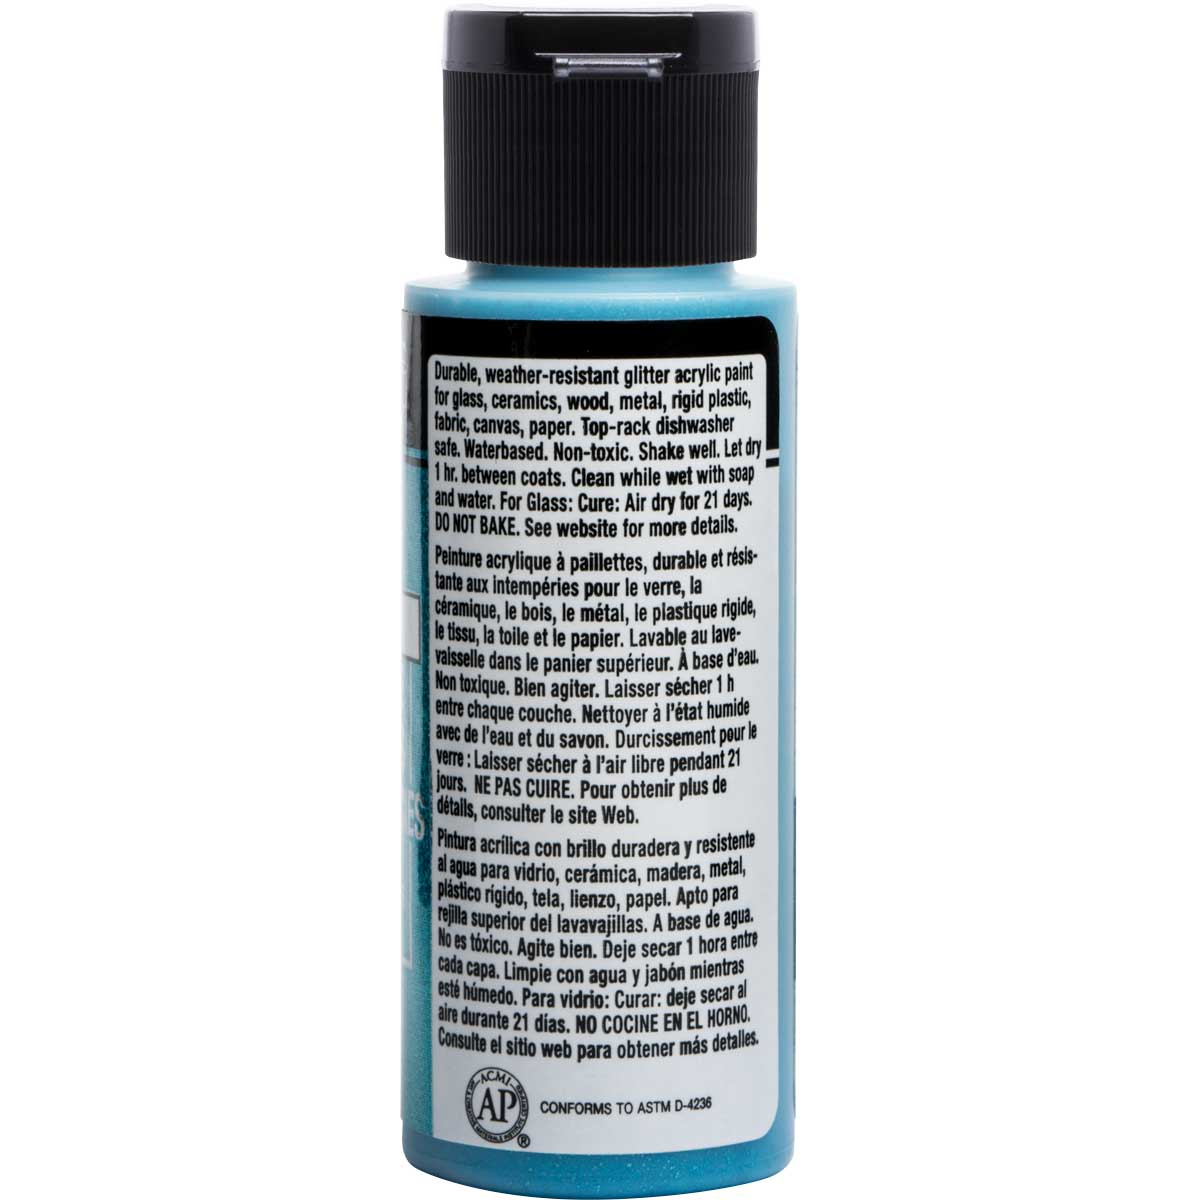 FolkArt ® Multi-Surface Glitter Acrylic Paints - Turquoise, 2 oz. - 2992